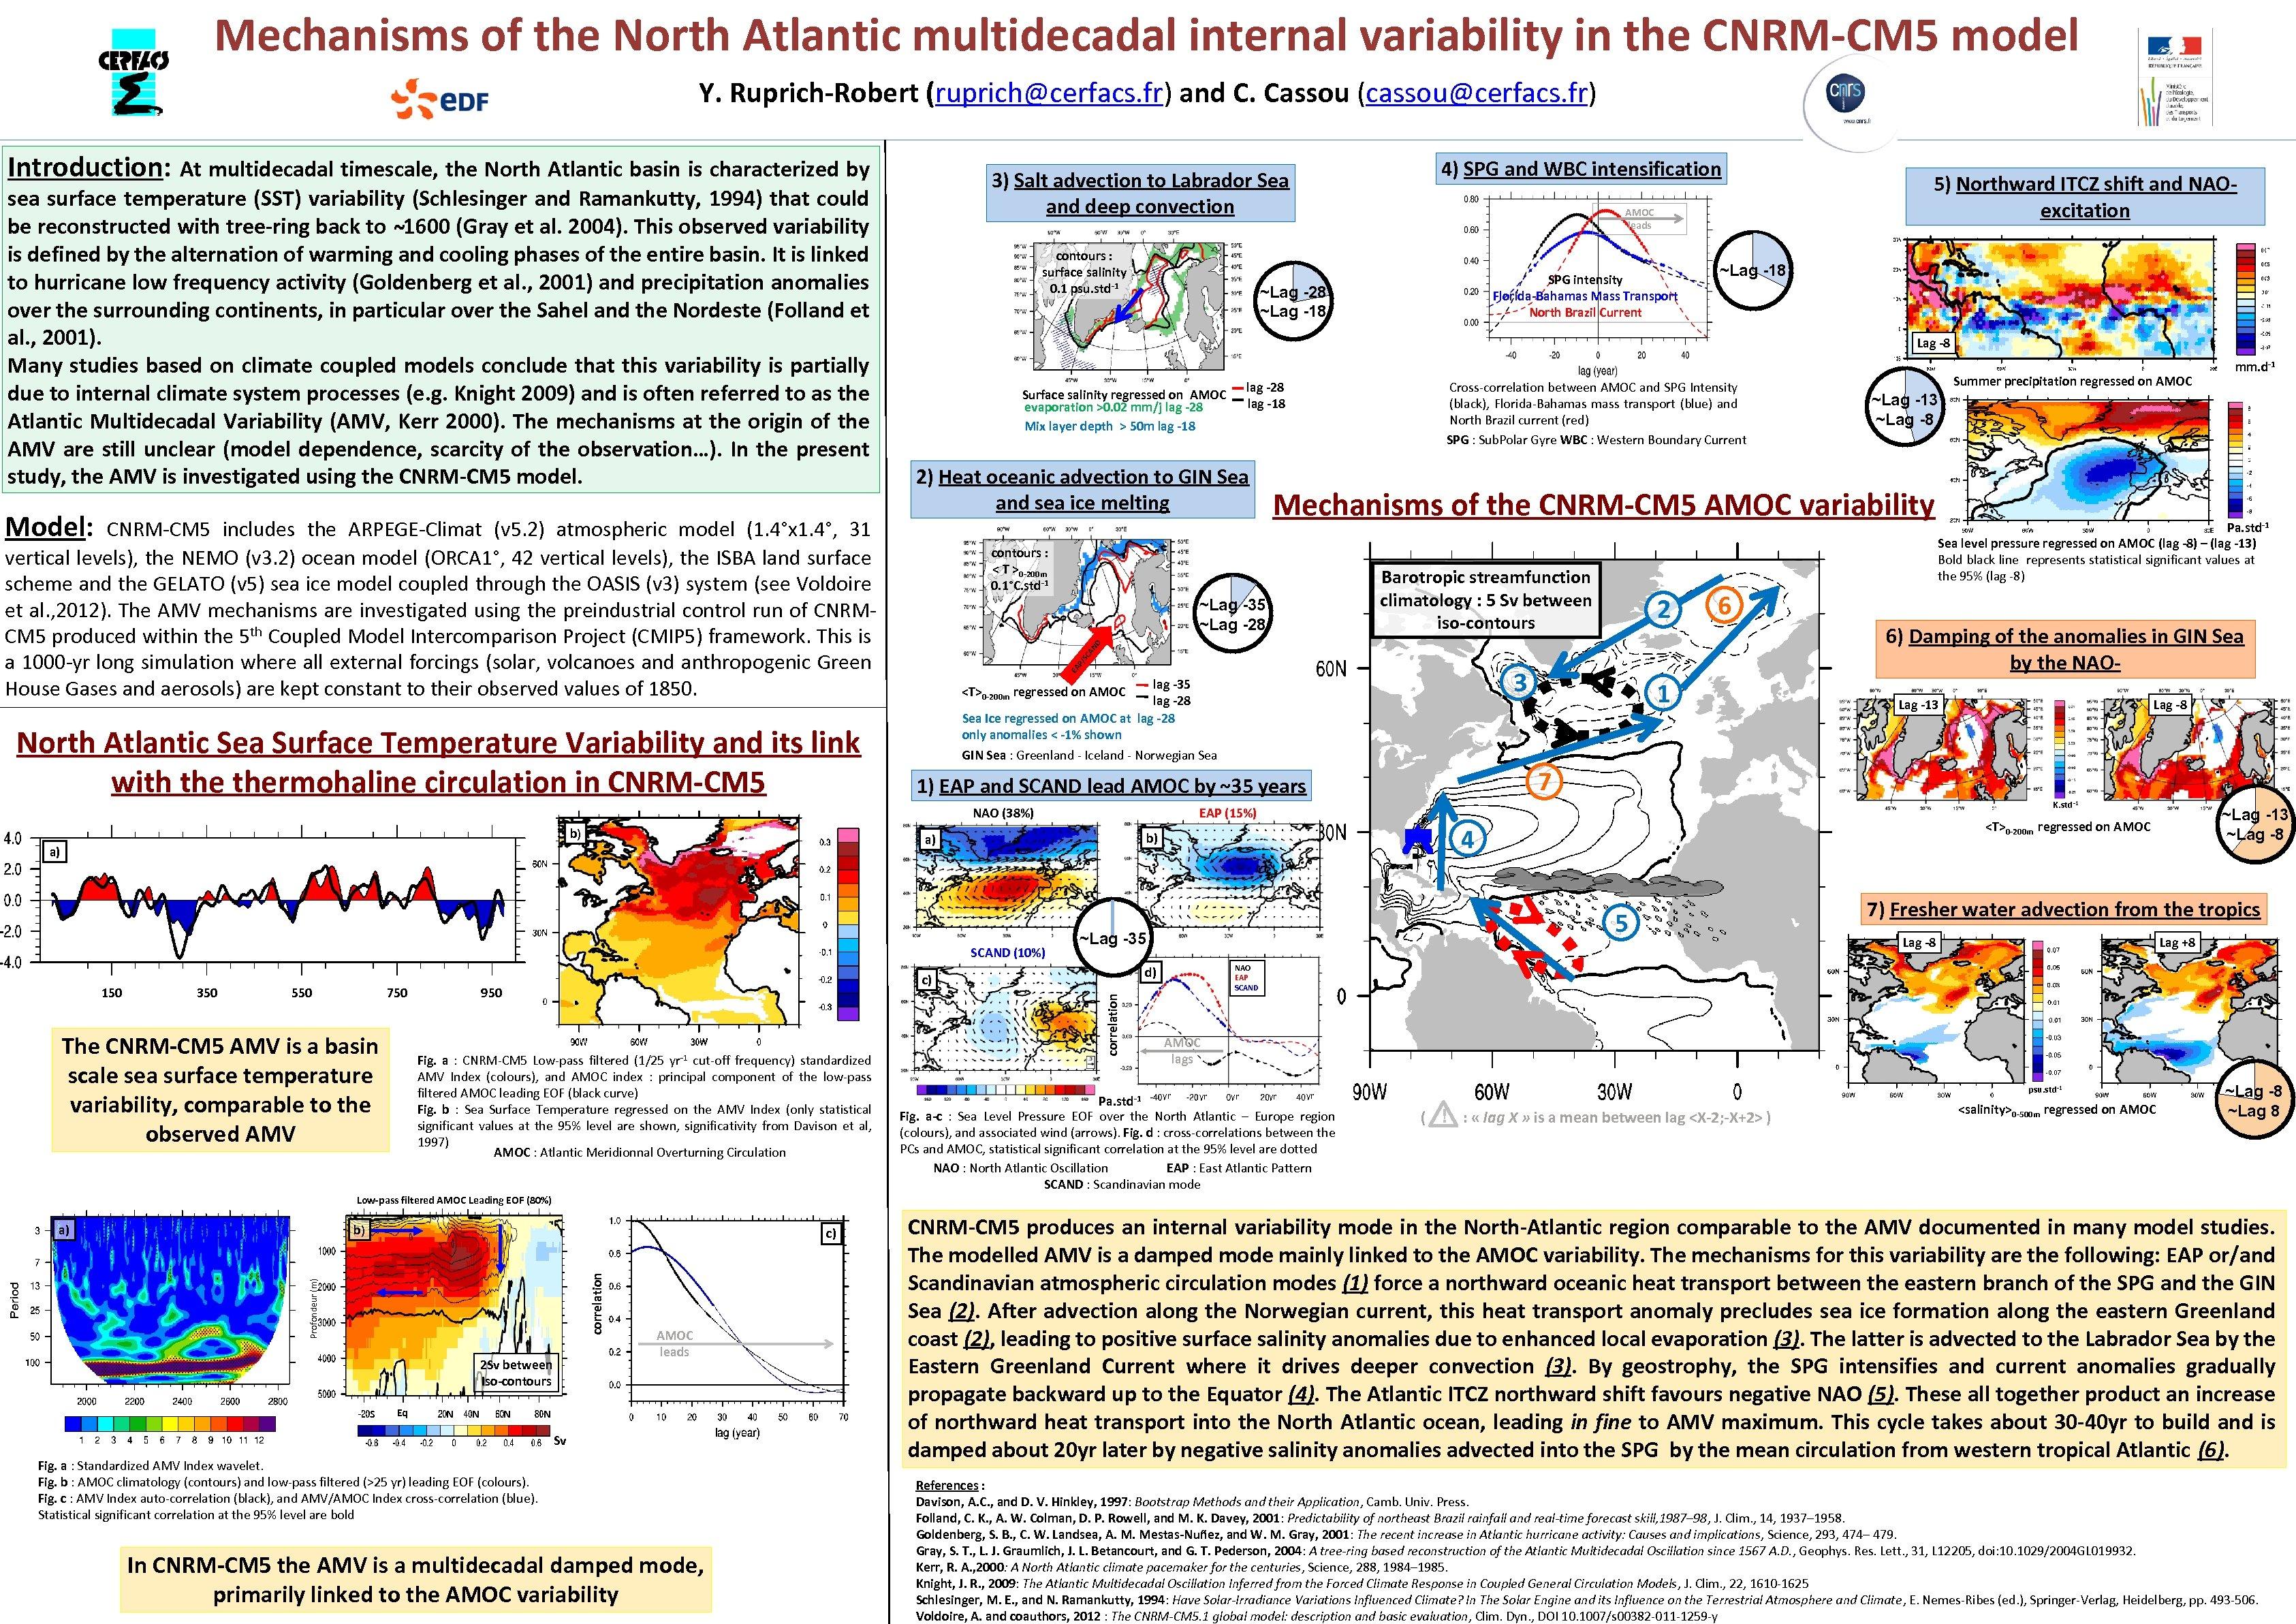 Mechanisms of the North Atlantic multidecadal internal variability in the CNRM-CM 5 model Y.